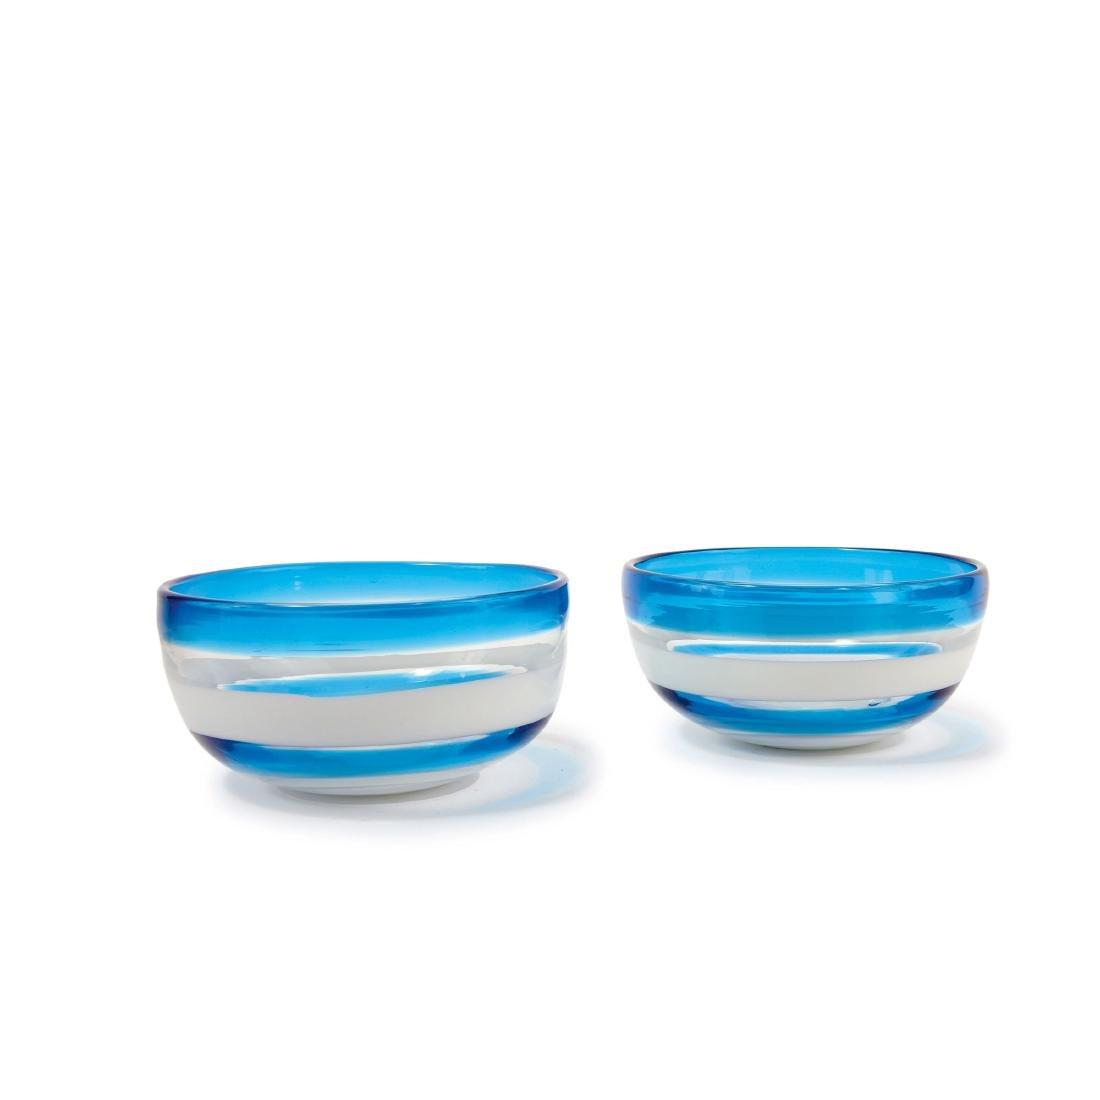 Two 'A fasce' bowls, c1953